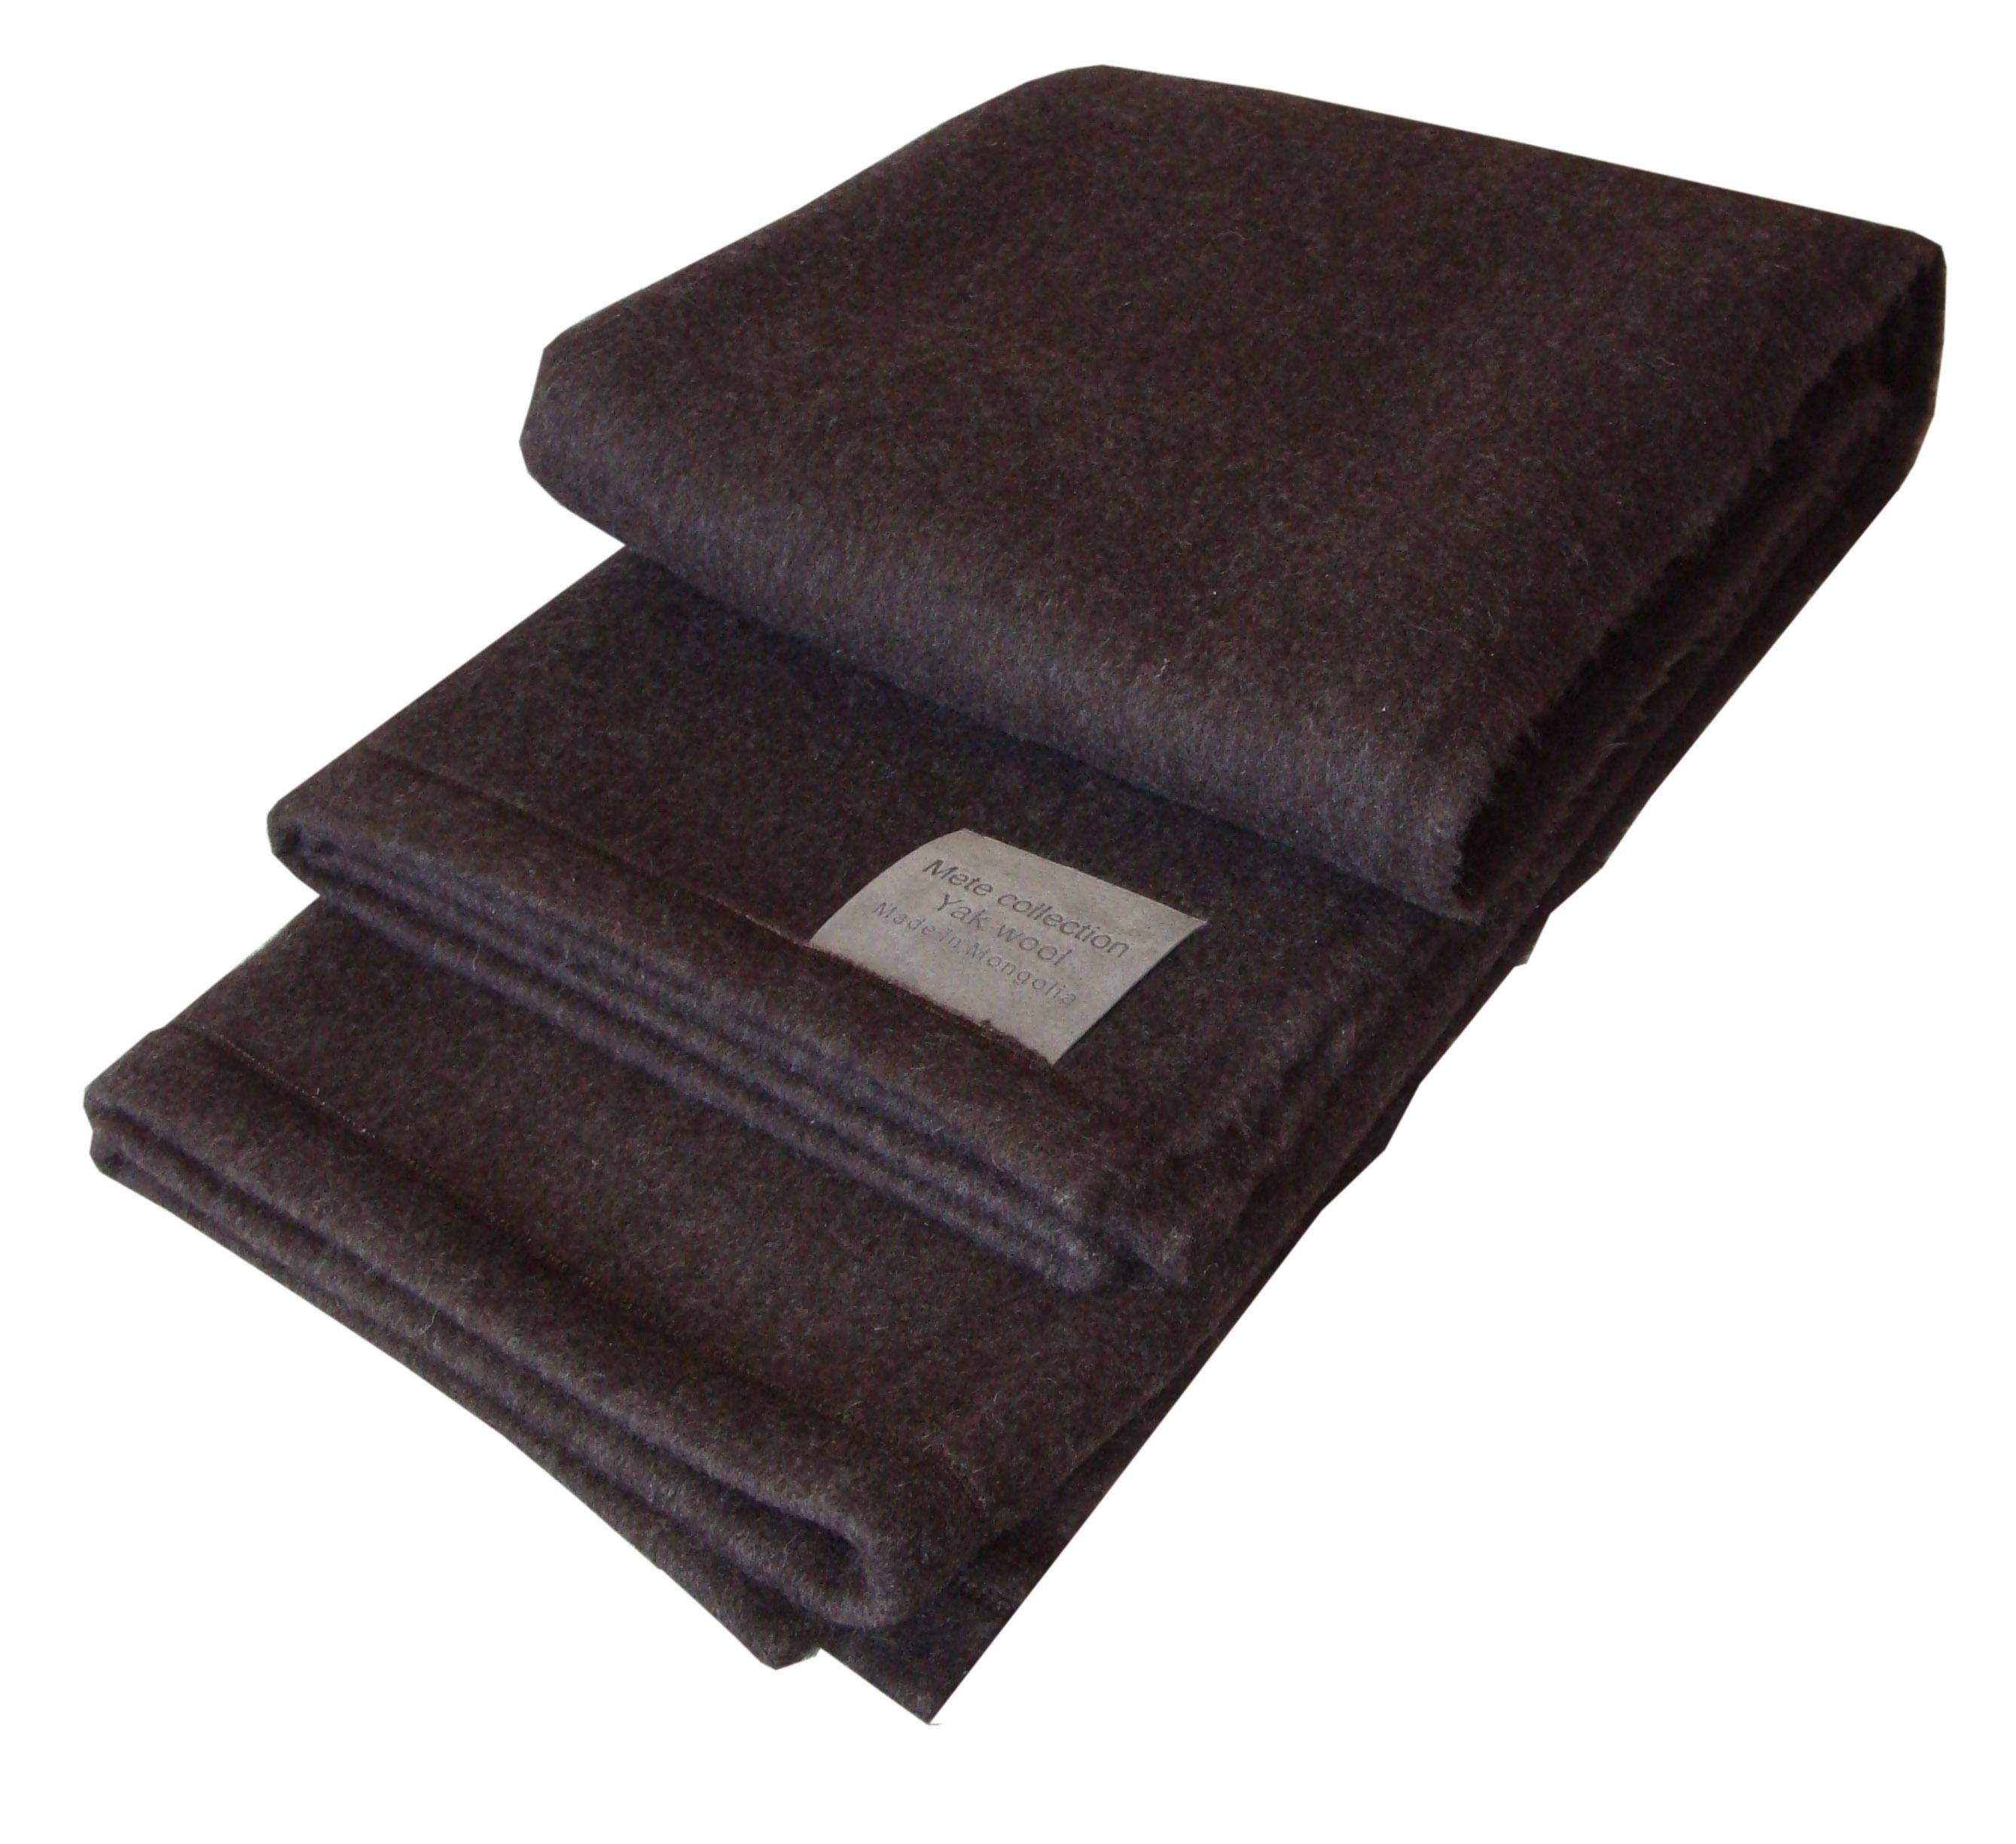 warm yak wool blanket